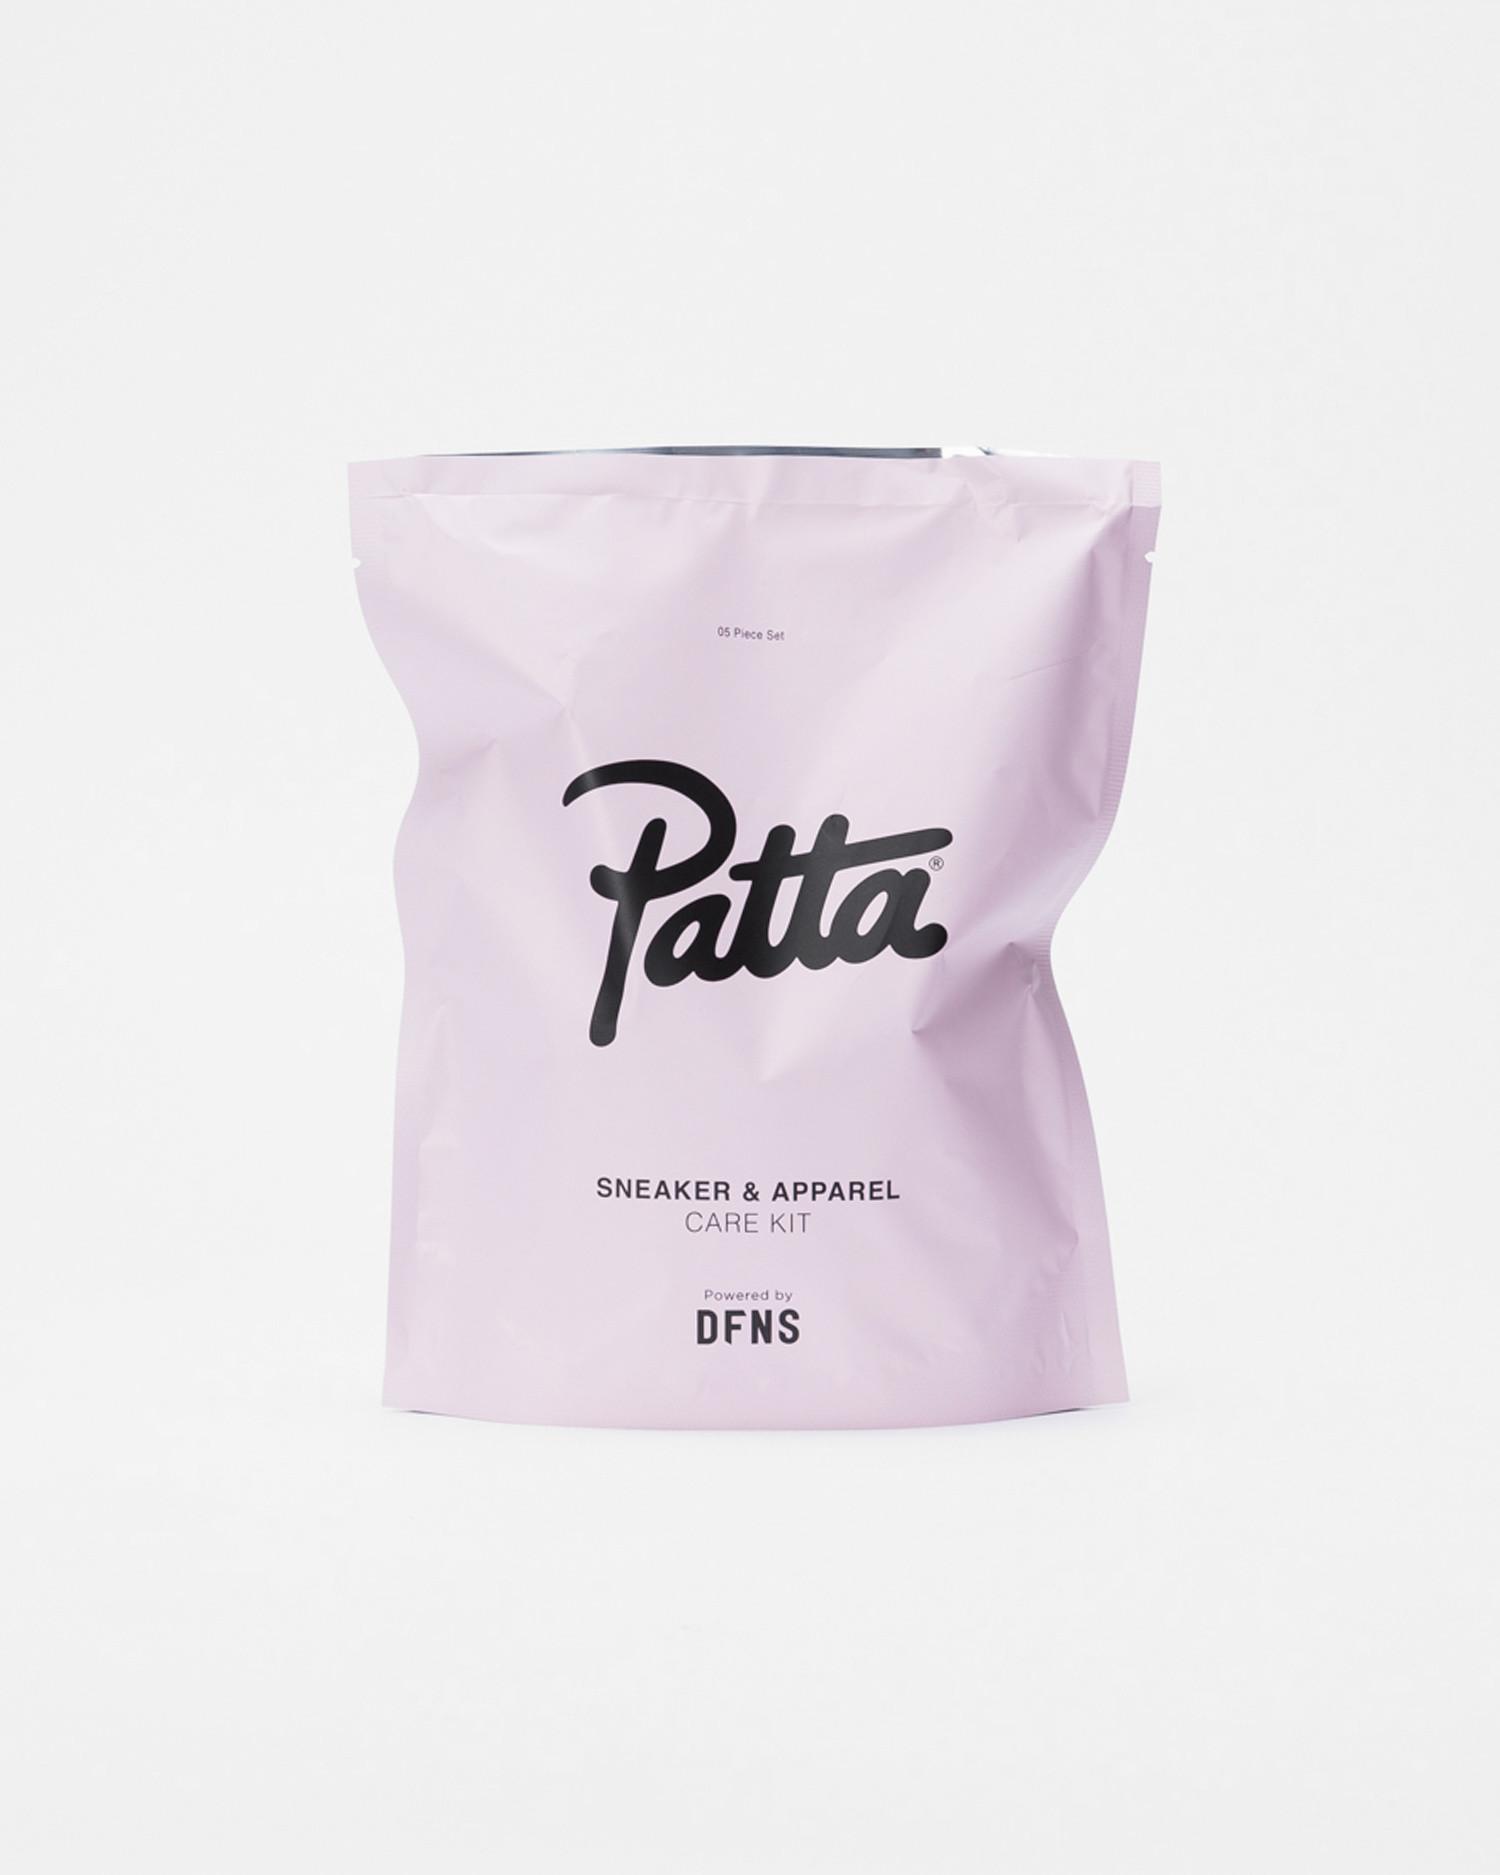 Patta Sneaker & Apparel Care Kit